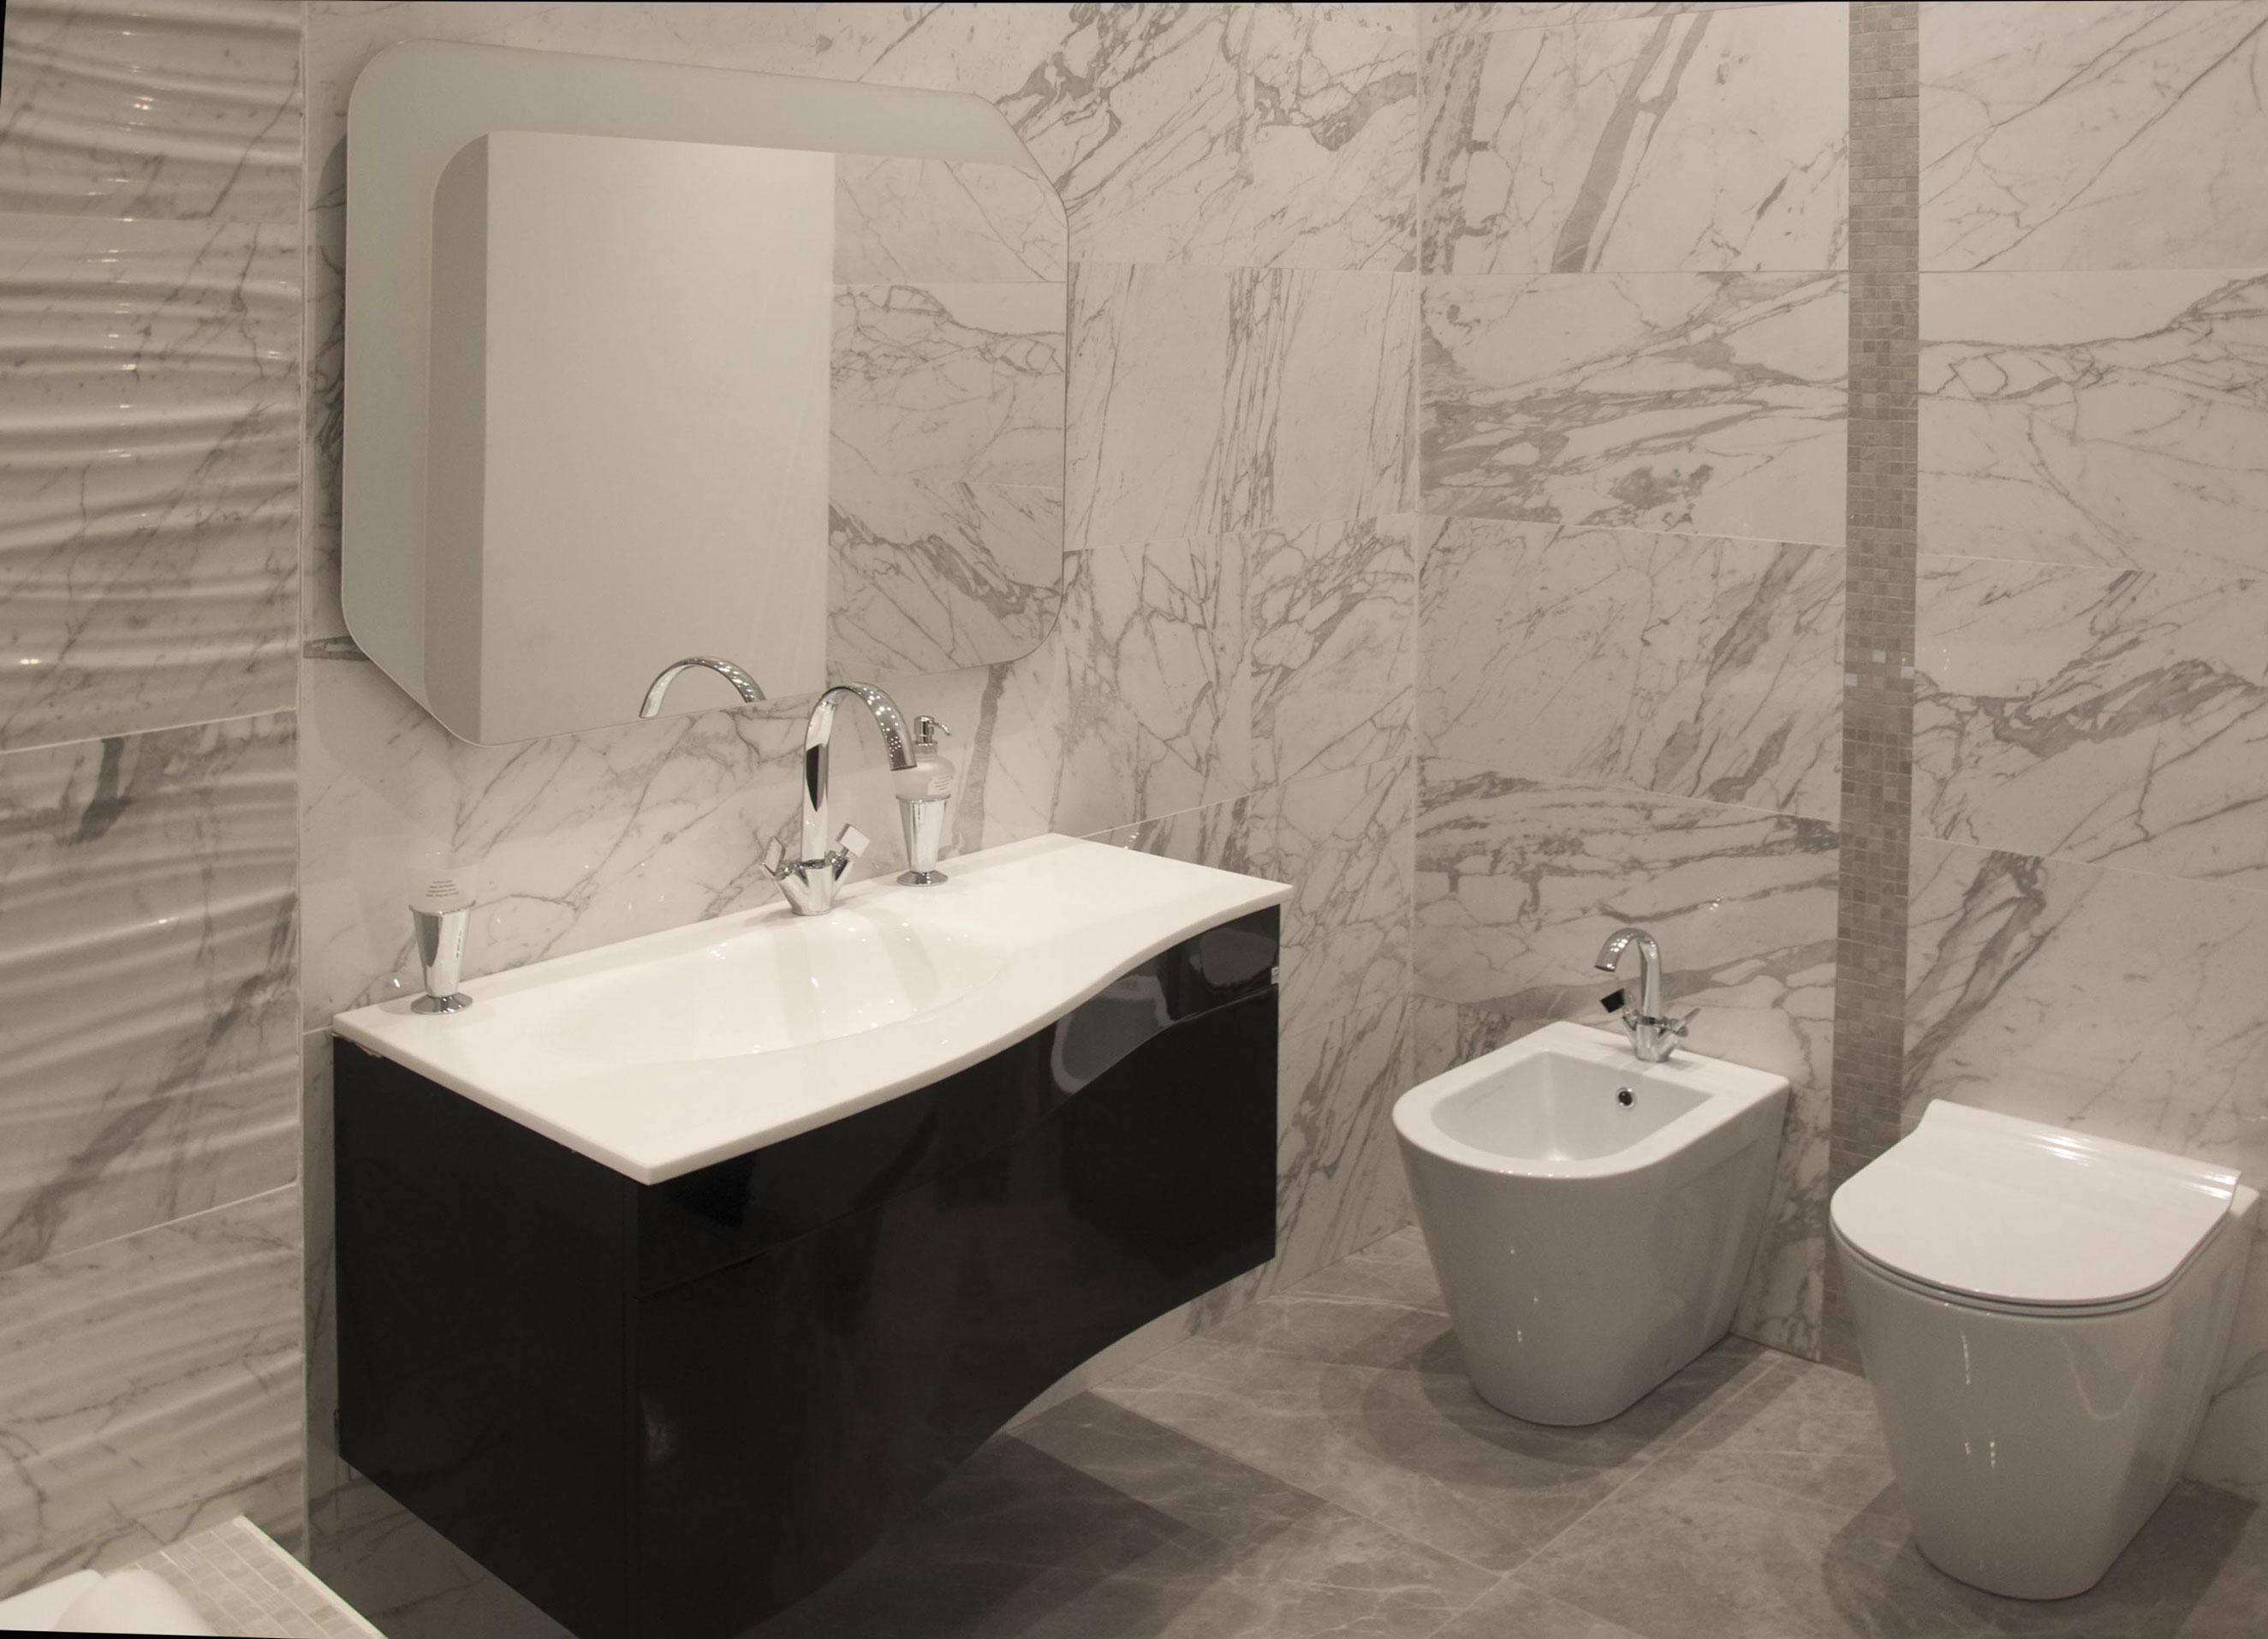 Beautiful Mobili Bagno Roma Images - Modern Home Design - orangetech.us